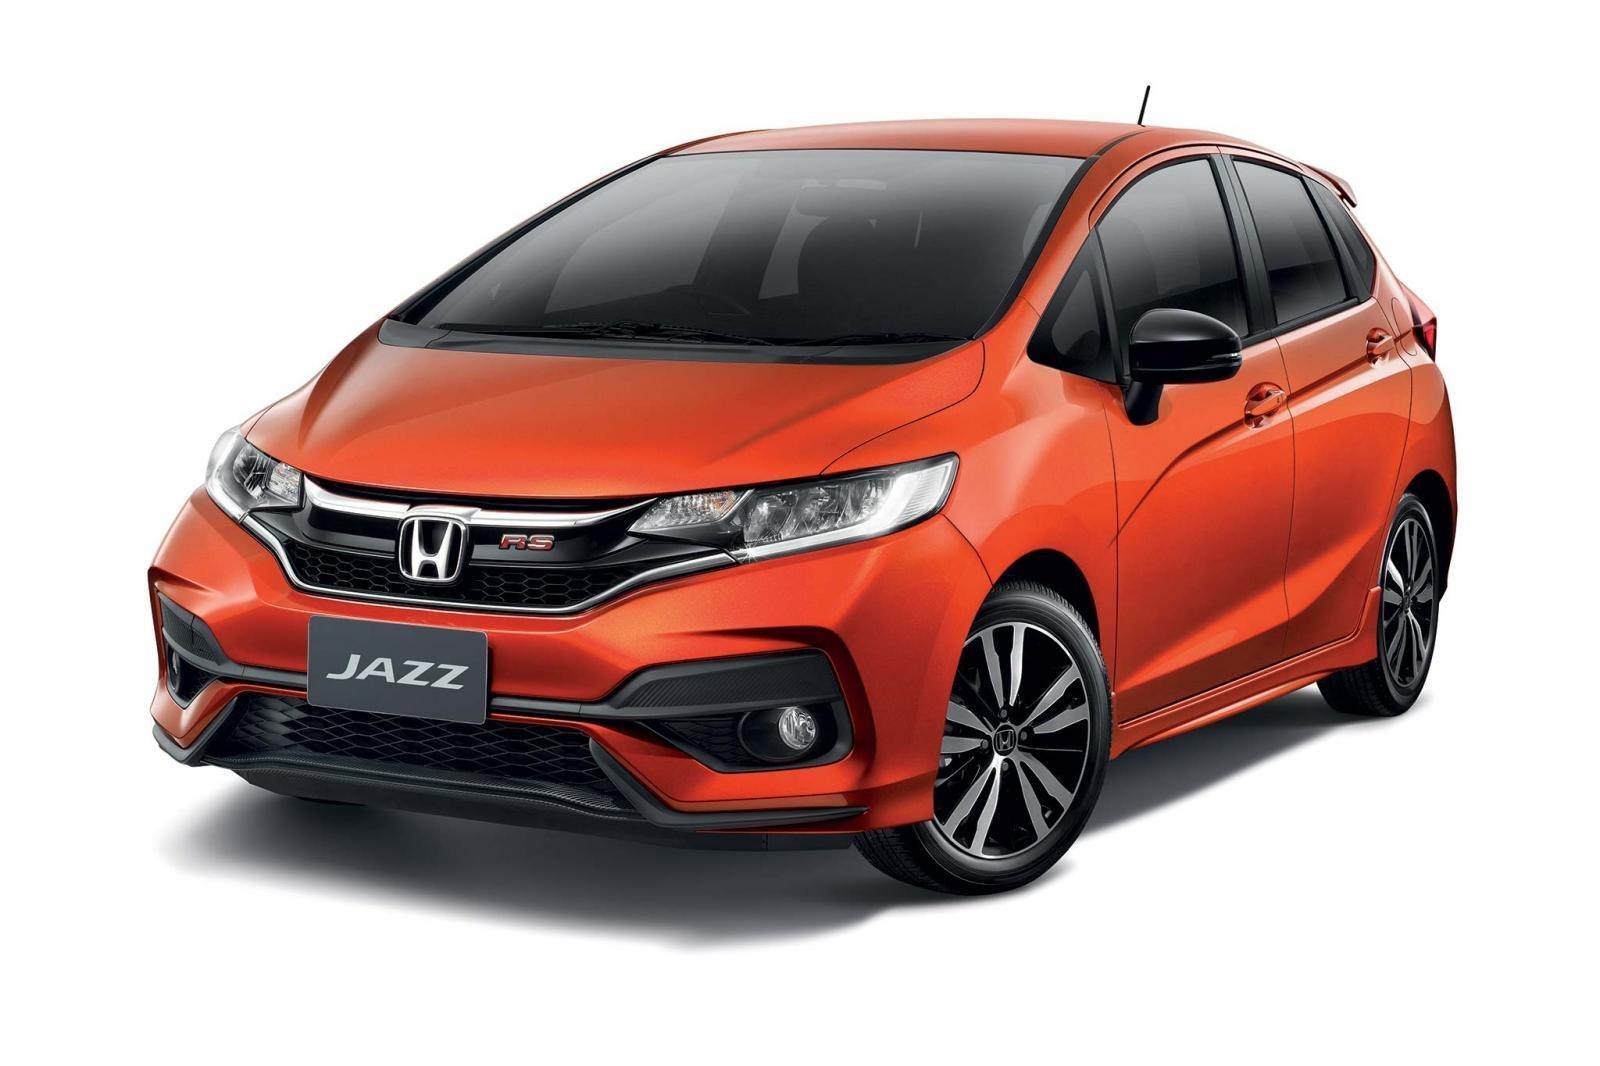 Đánh giá xe Honda Jazz